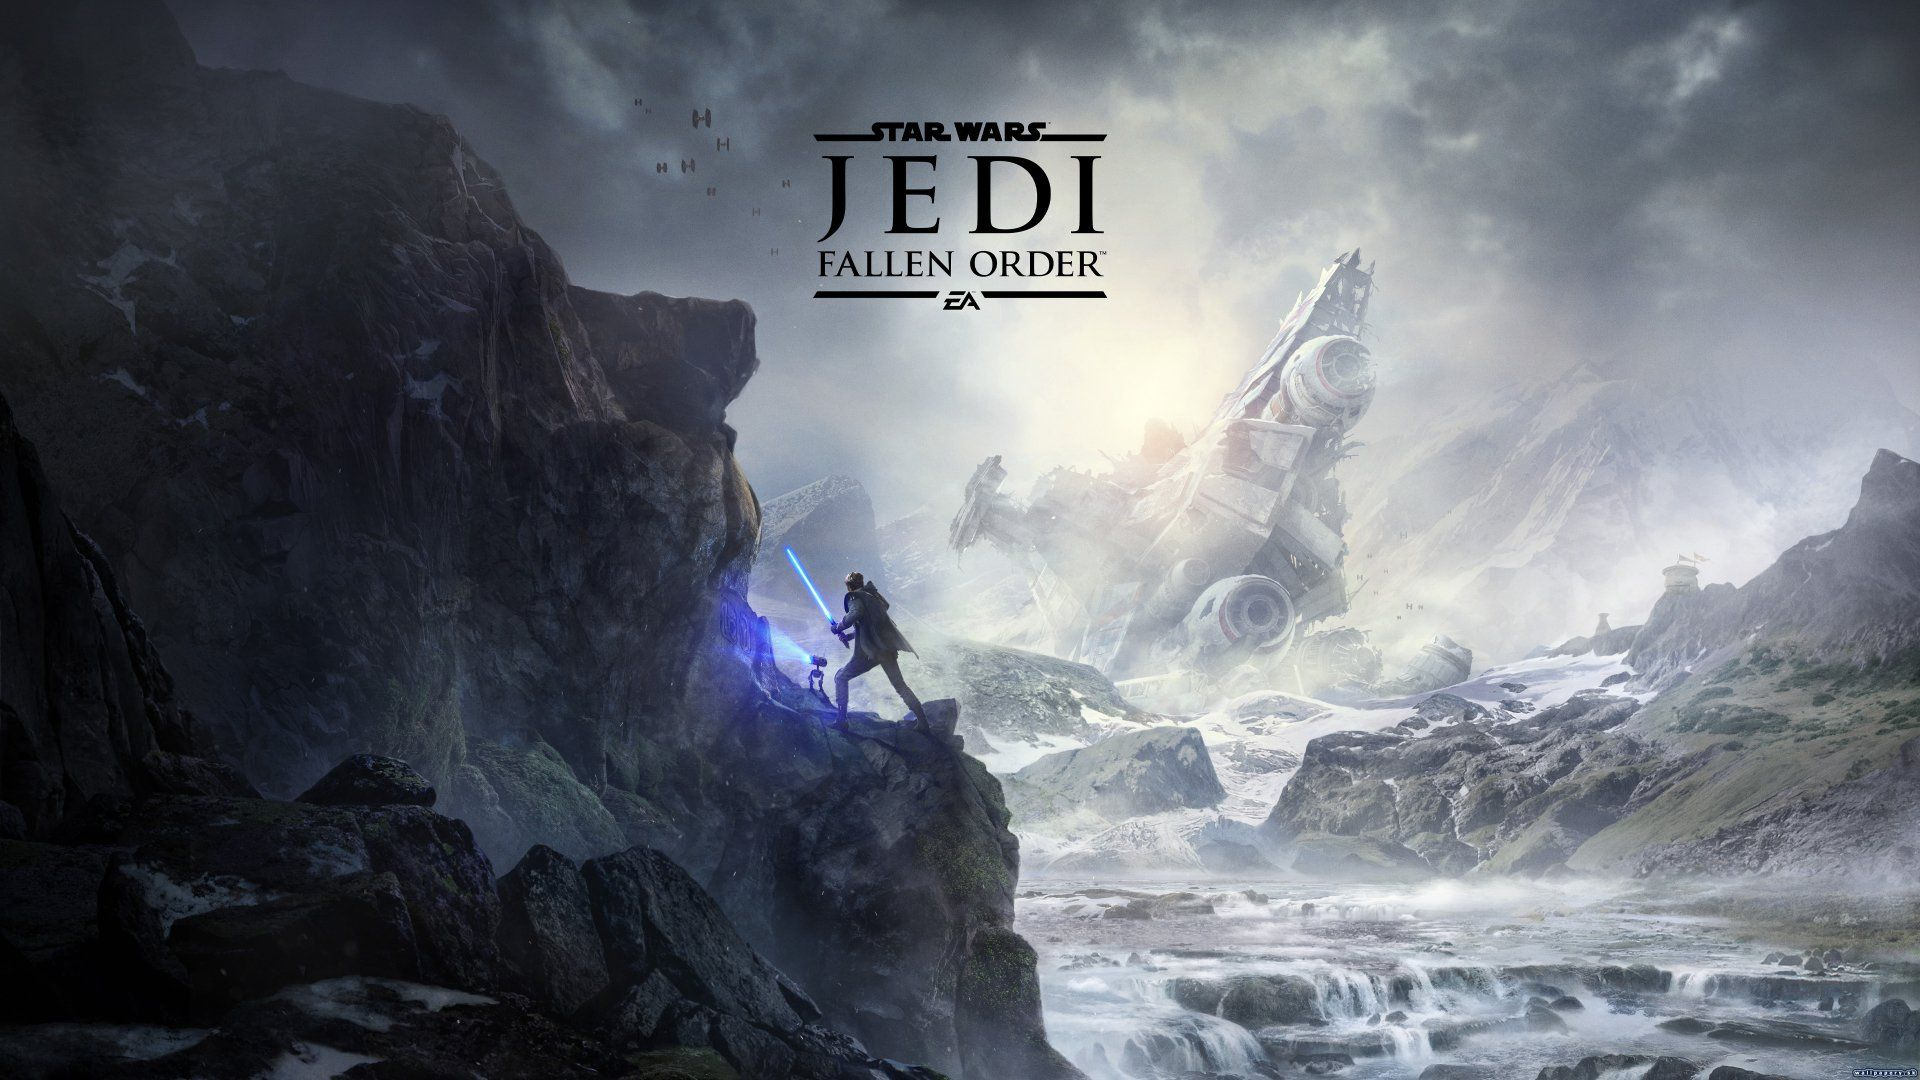 Star Wars Jedi Fallen Order Wallpapers Top Free Star Wars Jedi Fallen Order Backgrounds Wallpaperaccess